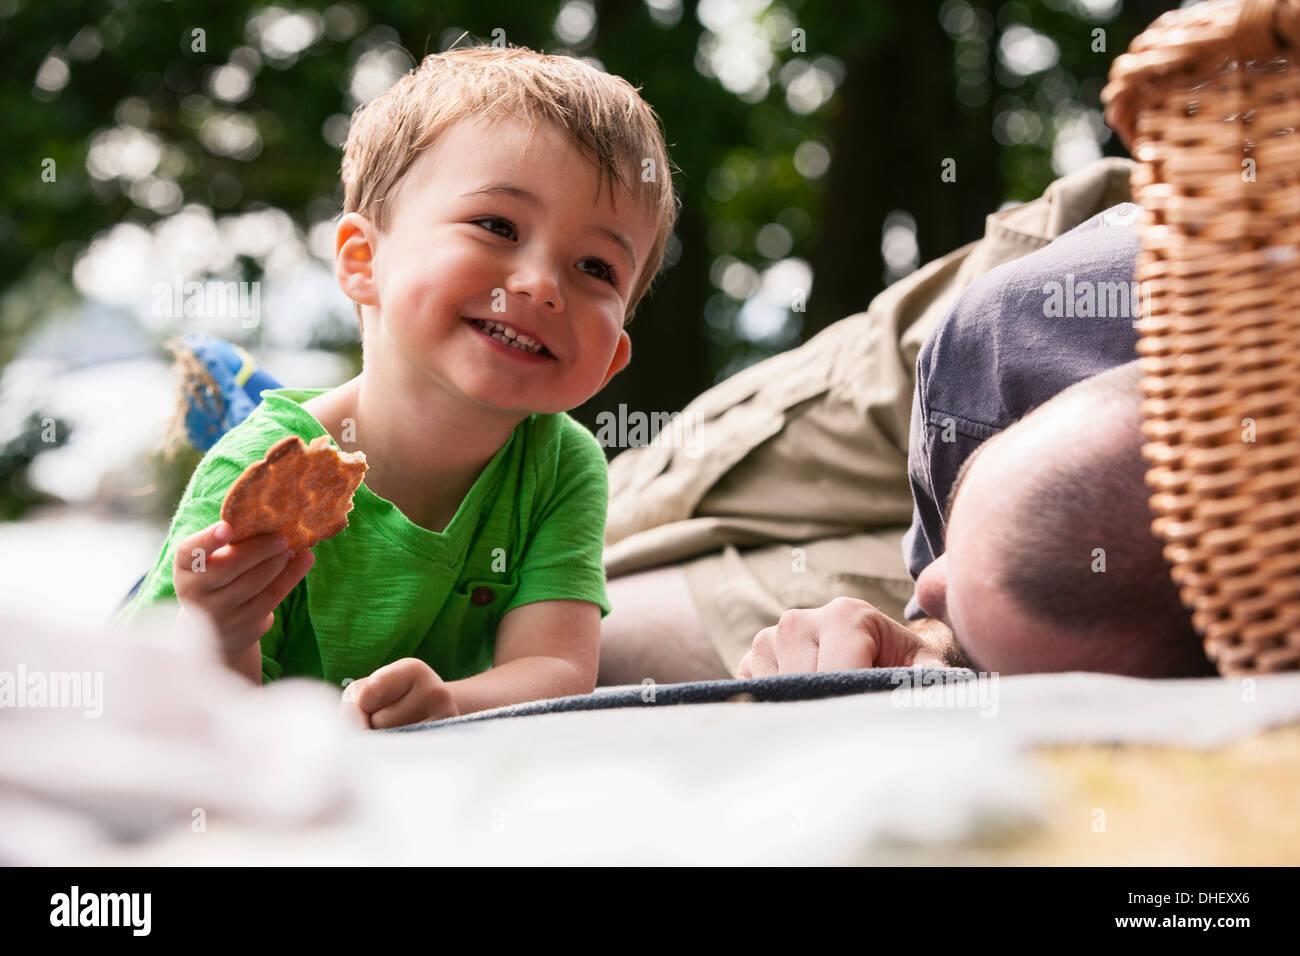 Junge genießt Picknick mit Vater Stockbild